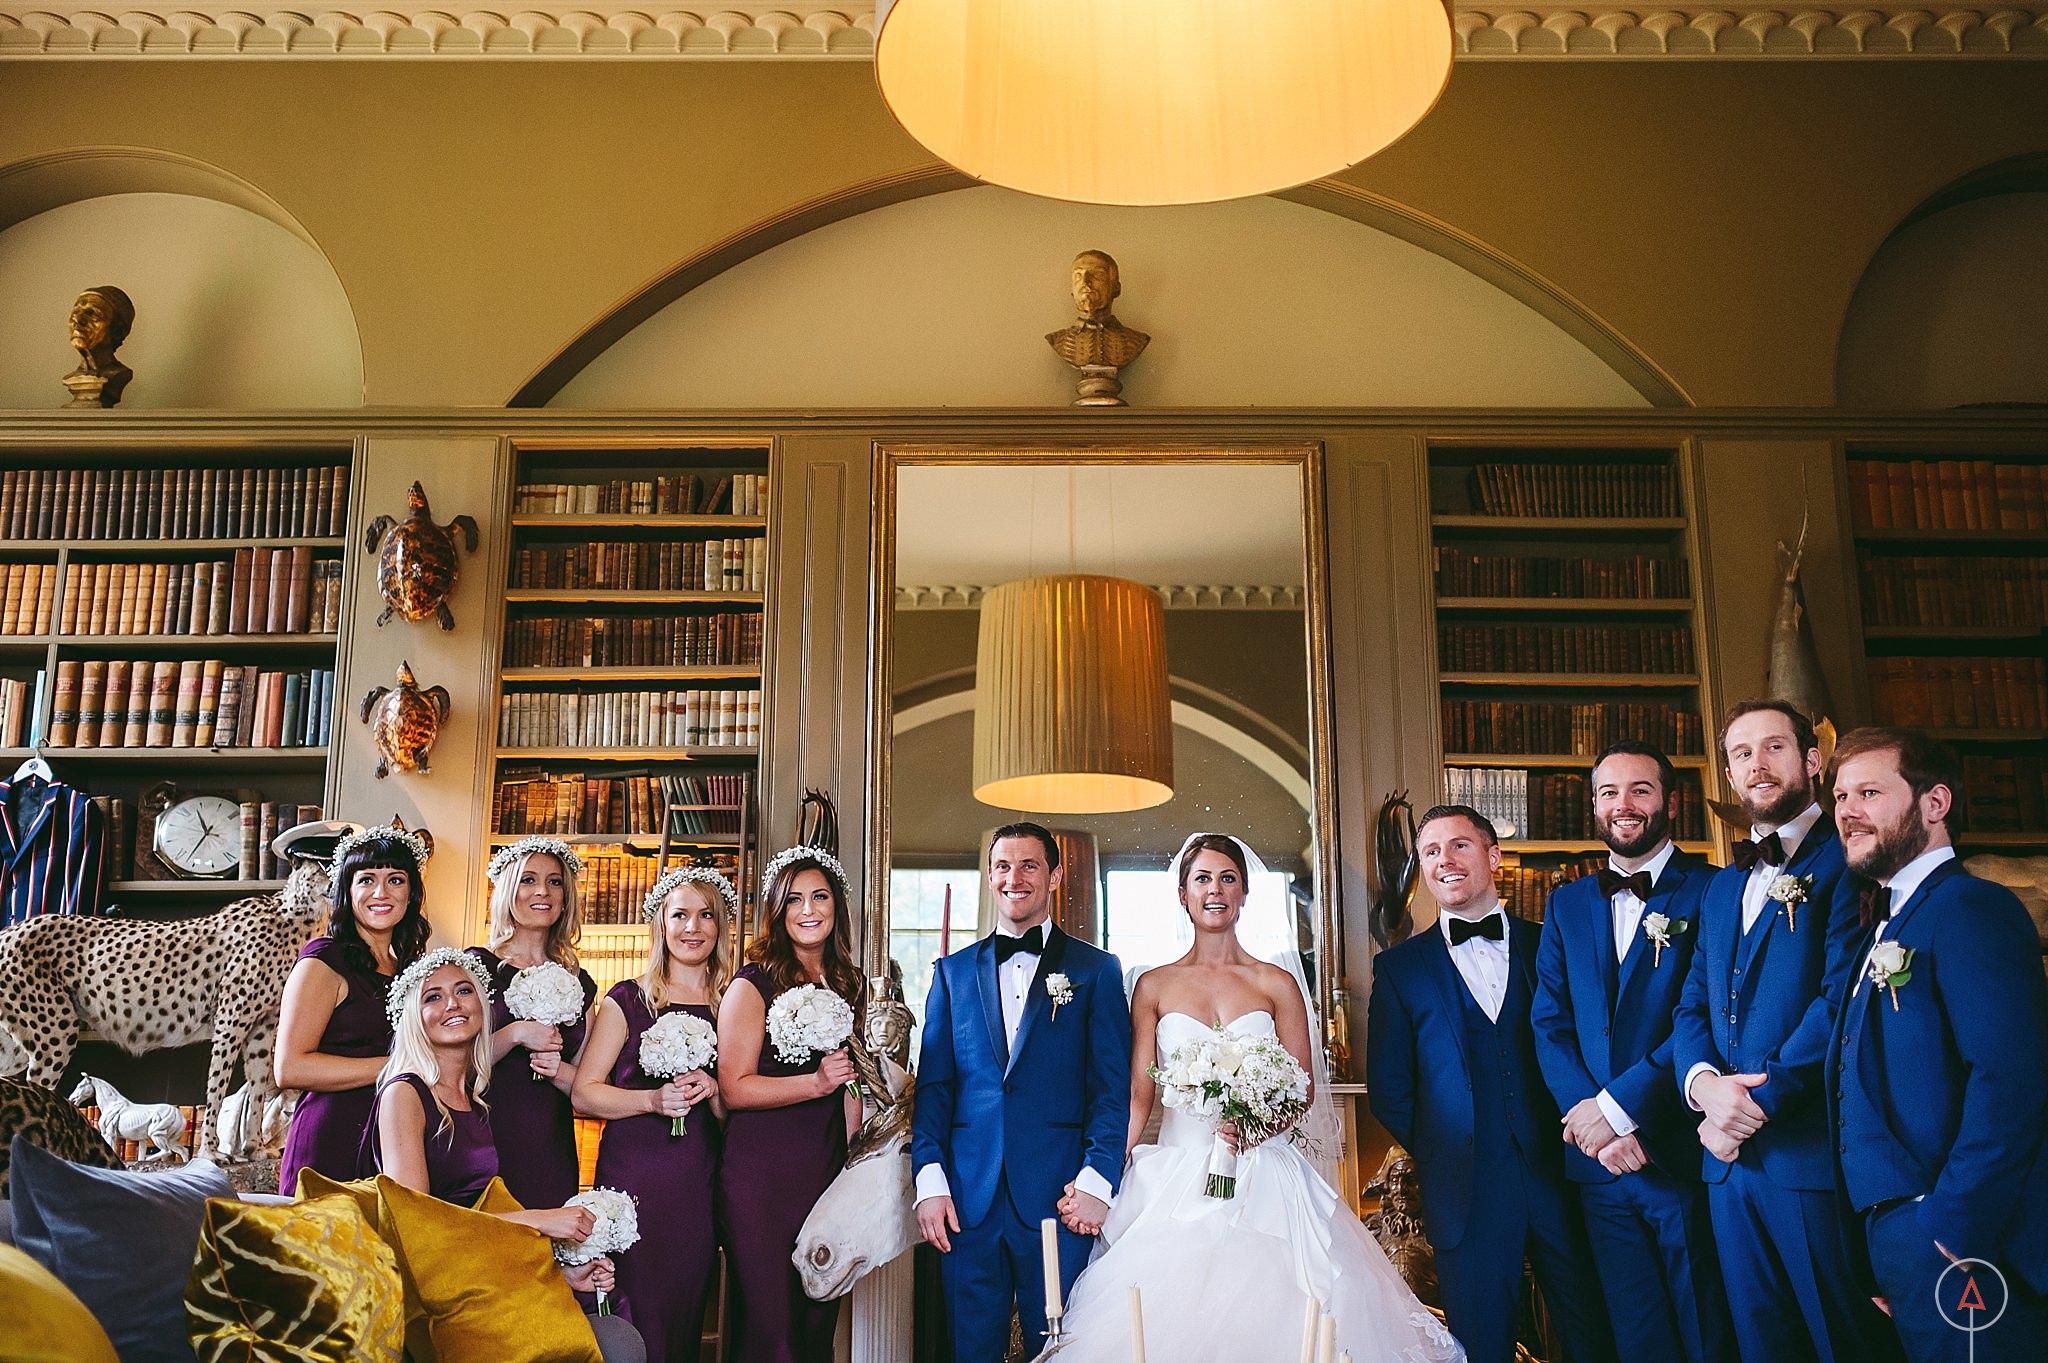 cardiff-wedding-photographer-aga-tomaszek_0267